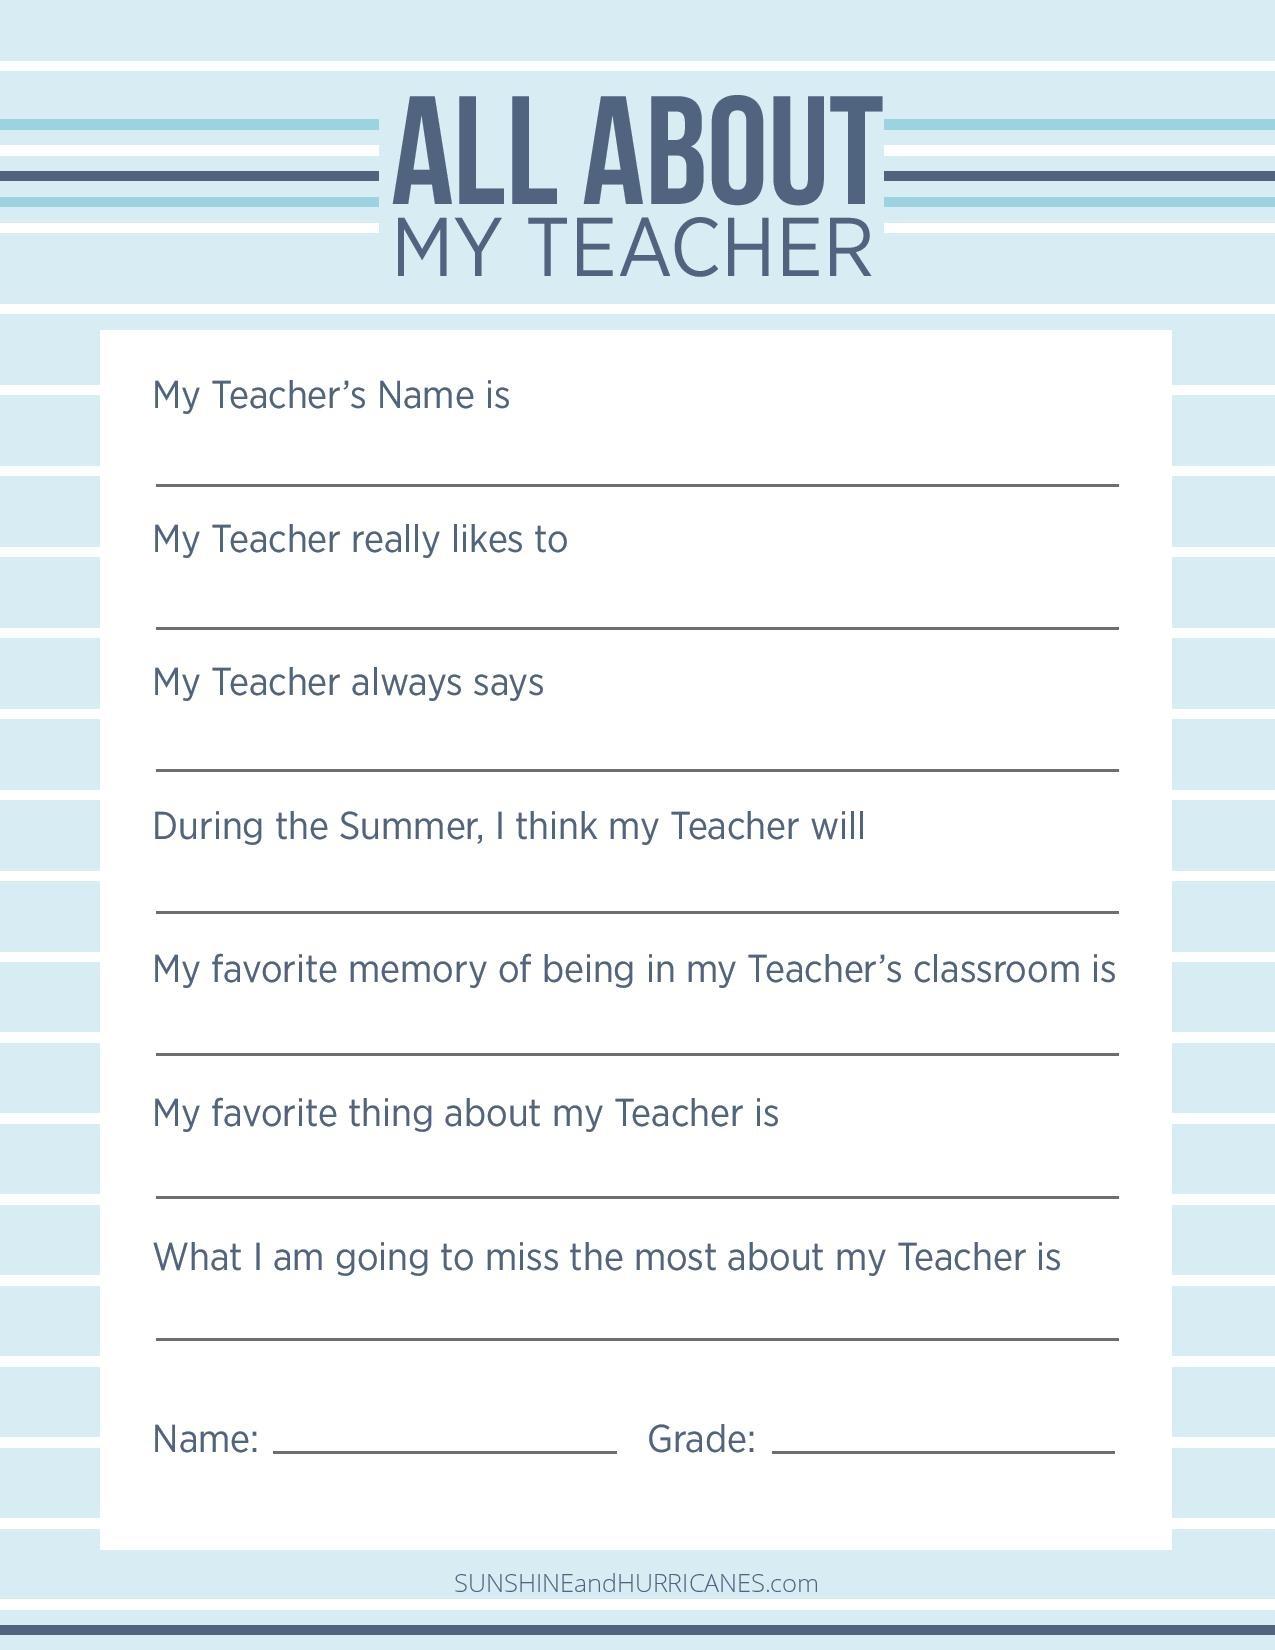 Teacher Appreciation Week Questionnaire - A Personalized Teacher Gift - Make A Printable Survey Free